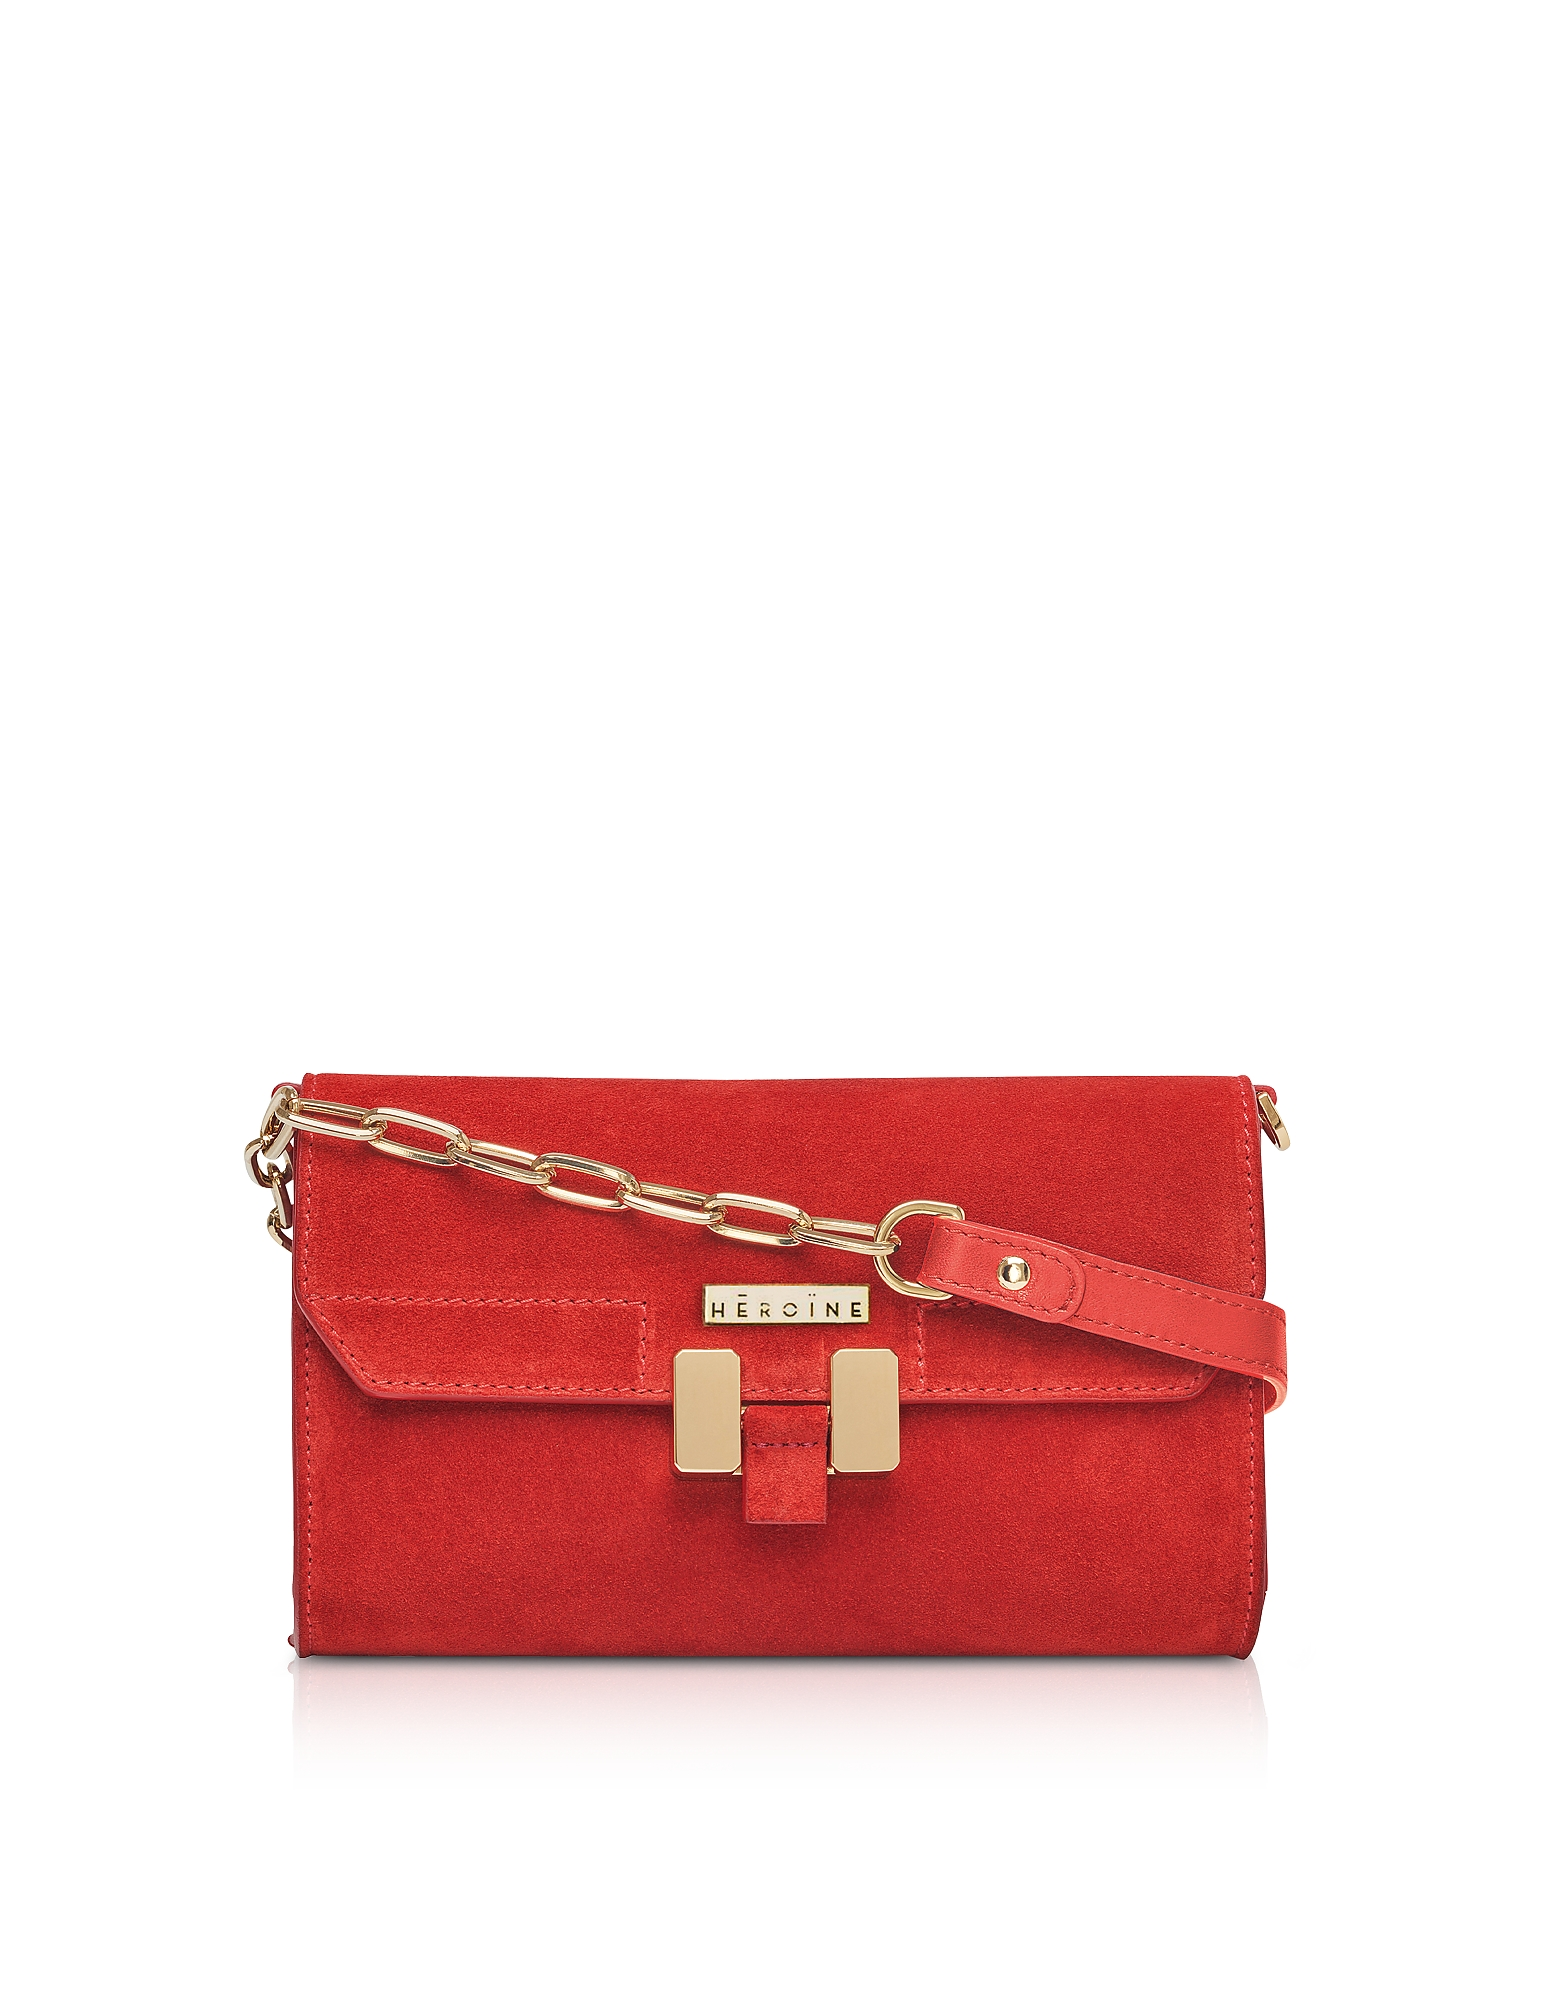 Maison Heroine Designer Handbags, Brick Suede Carrie Belt Bag